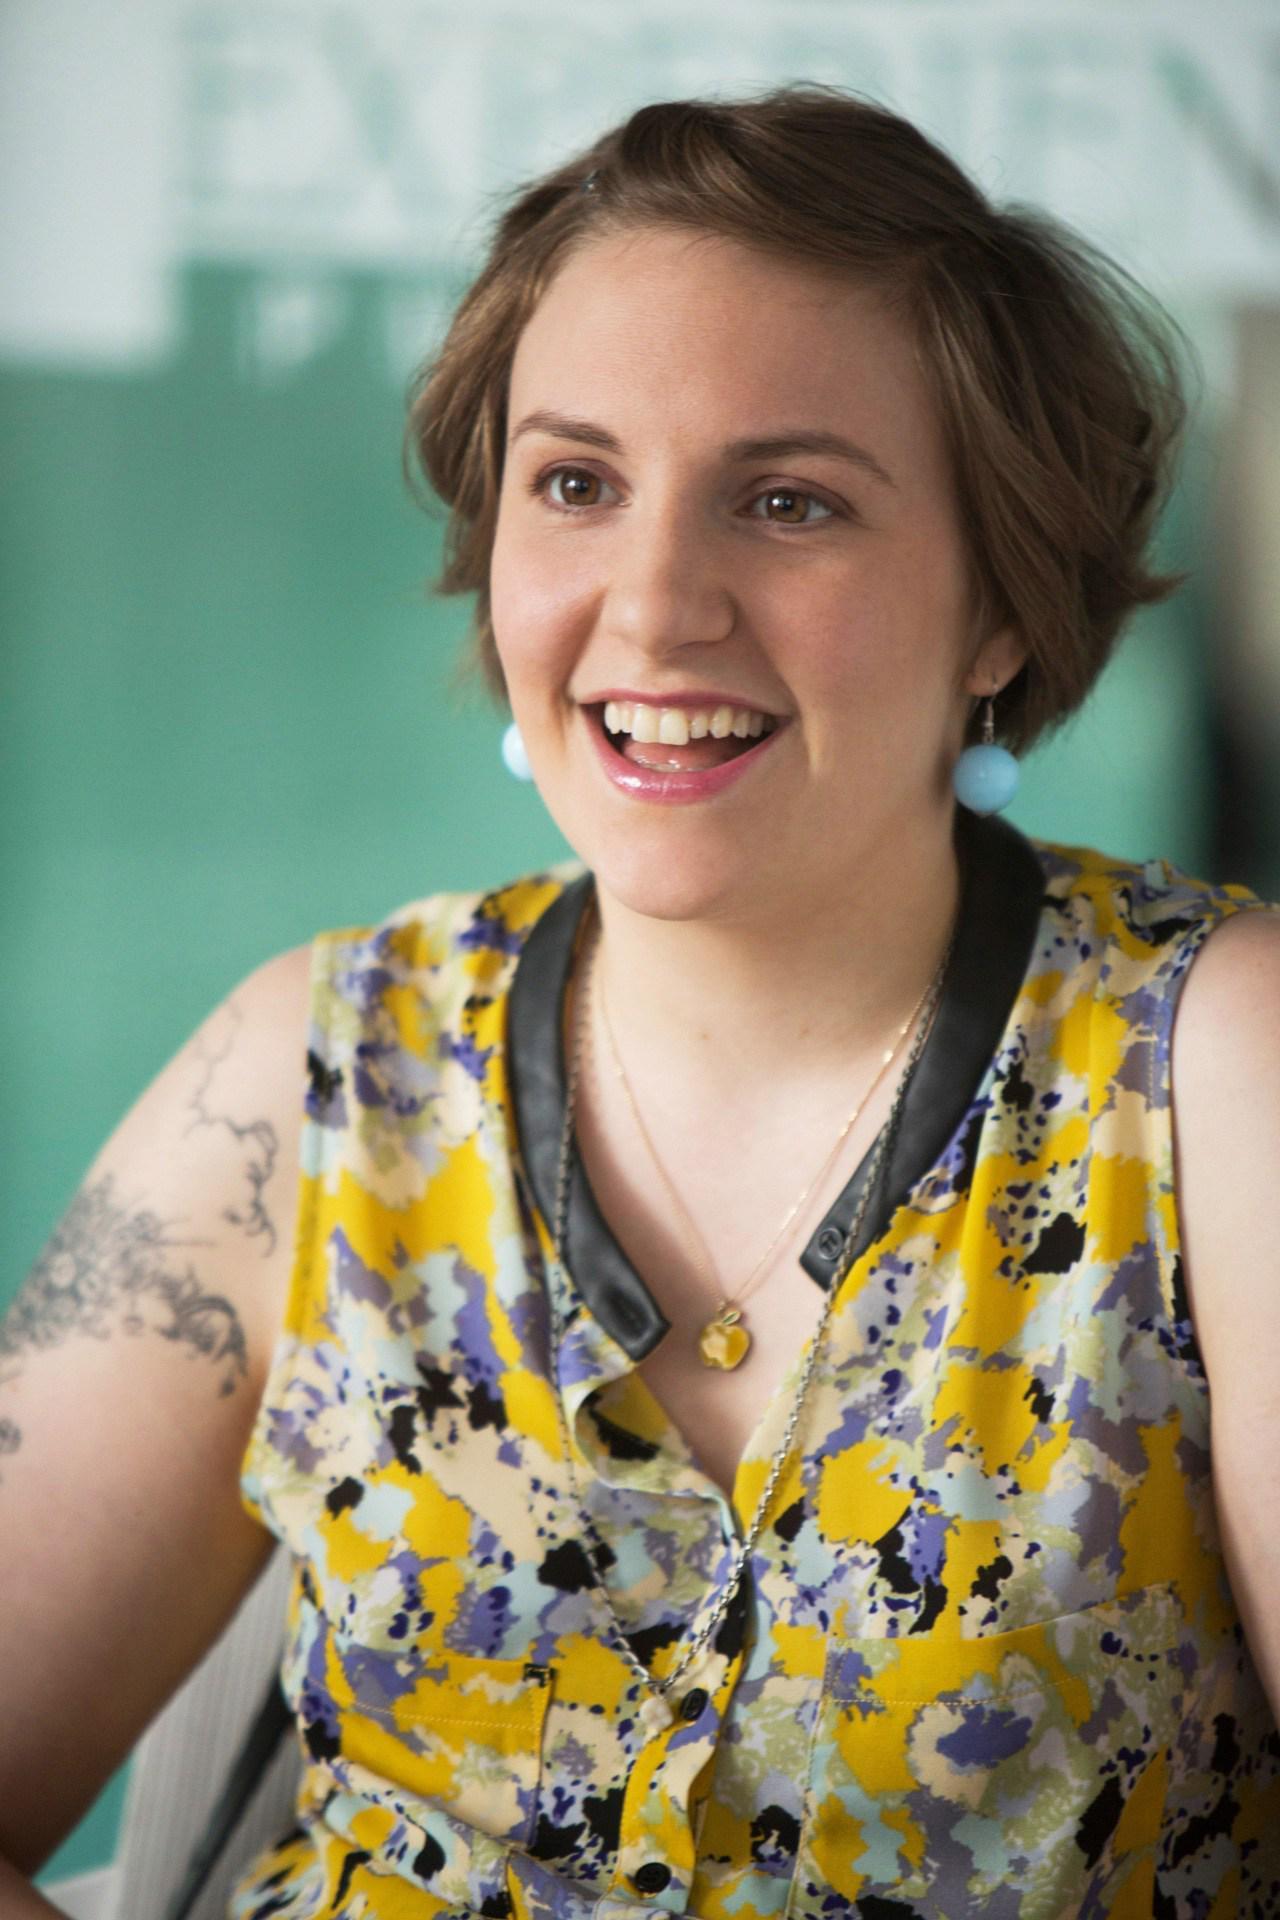 Who's @lenadunham's famous new intern? http://t.co/30rRptHJJF http://t.co/nff7HubQzC